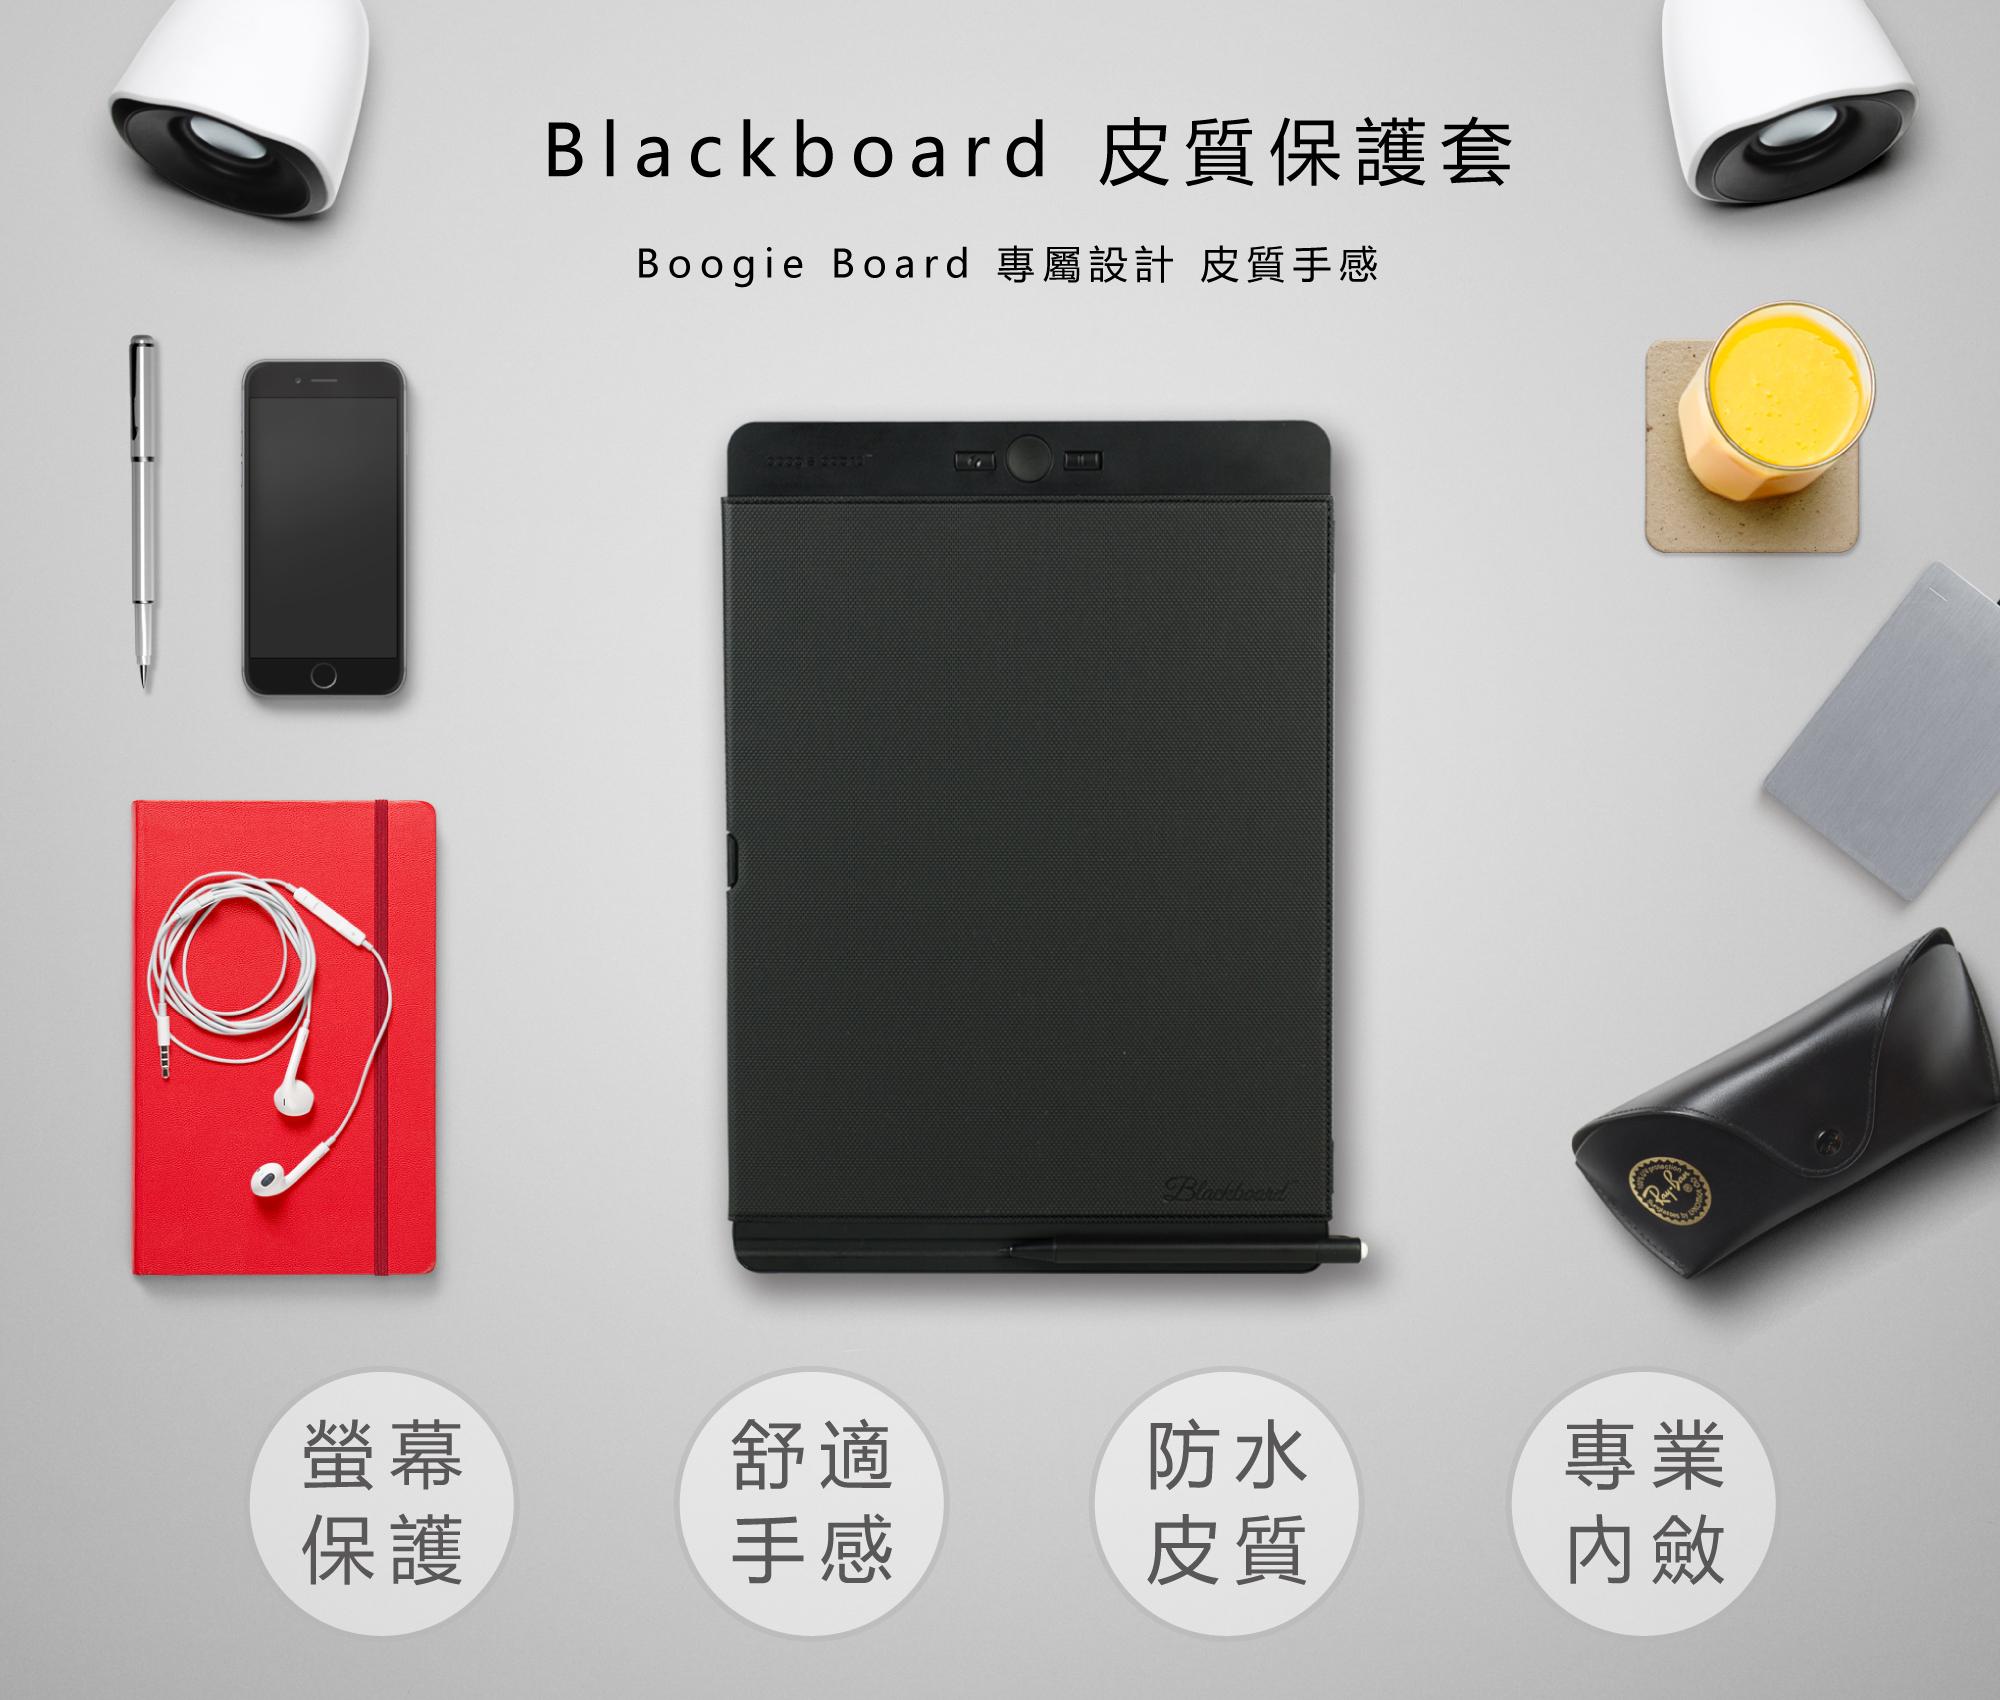 Boogie Board Blackboard Cover Designer Shinygoods Pinkoi Matador Travel Earplugs Kit Product Description